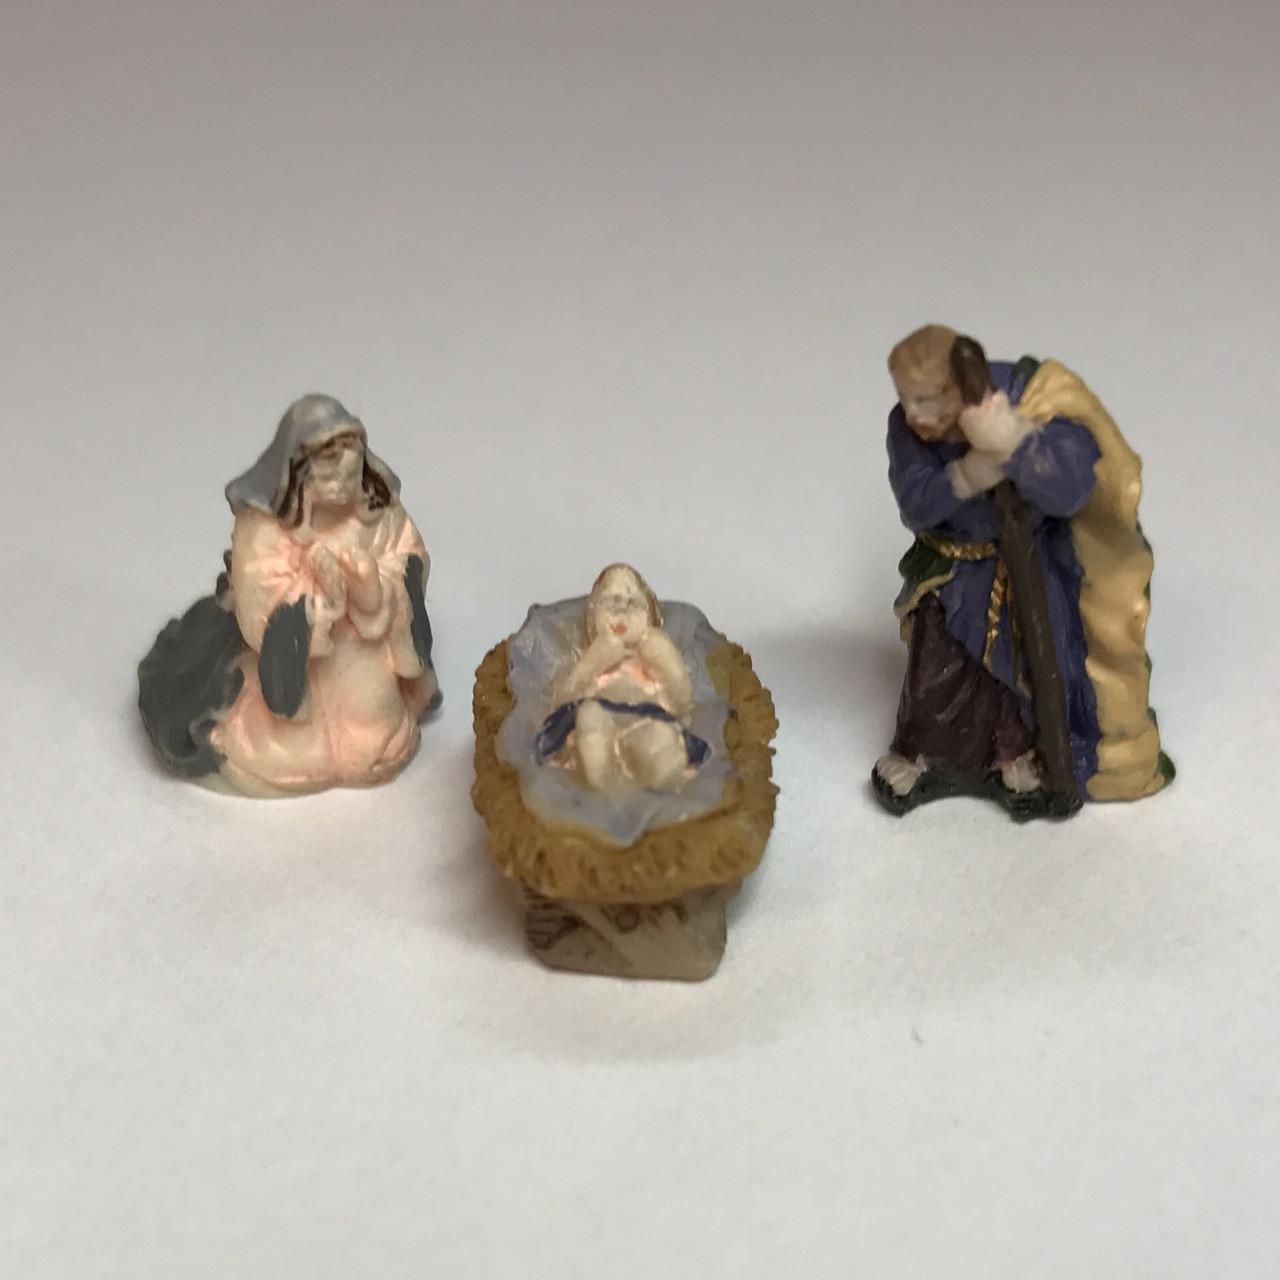 alternate image of miniature nativity